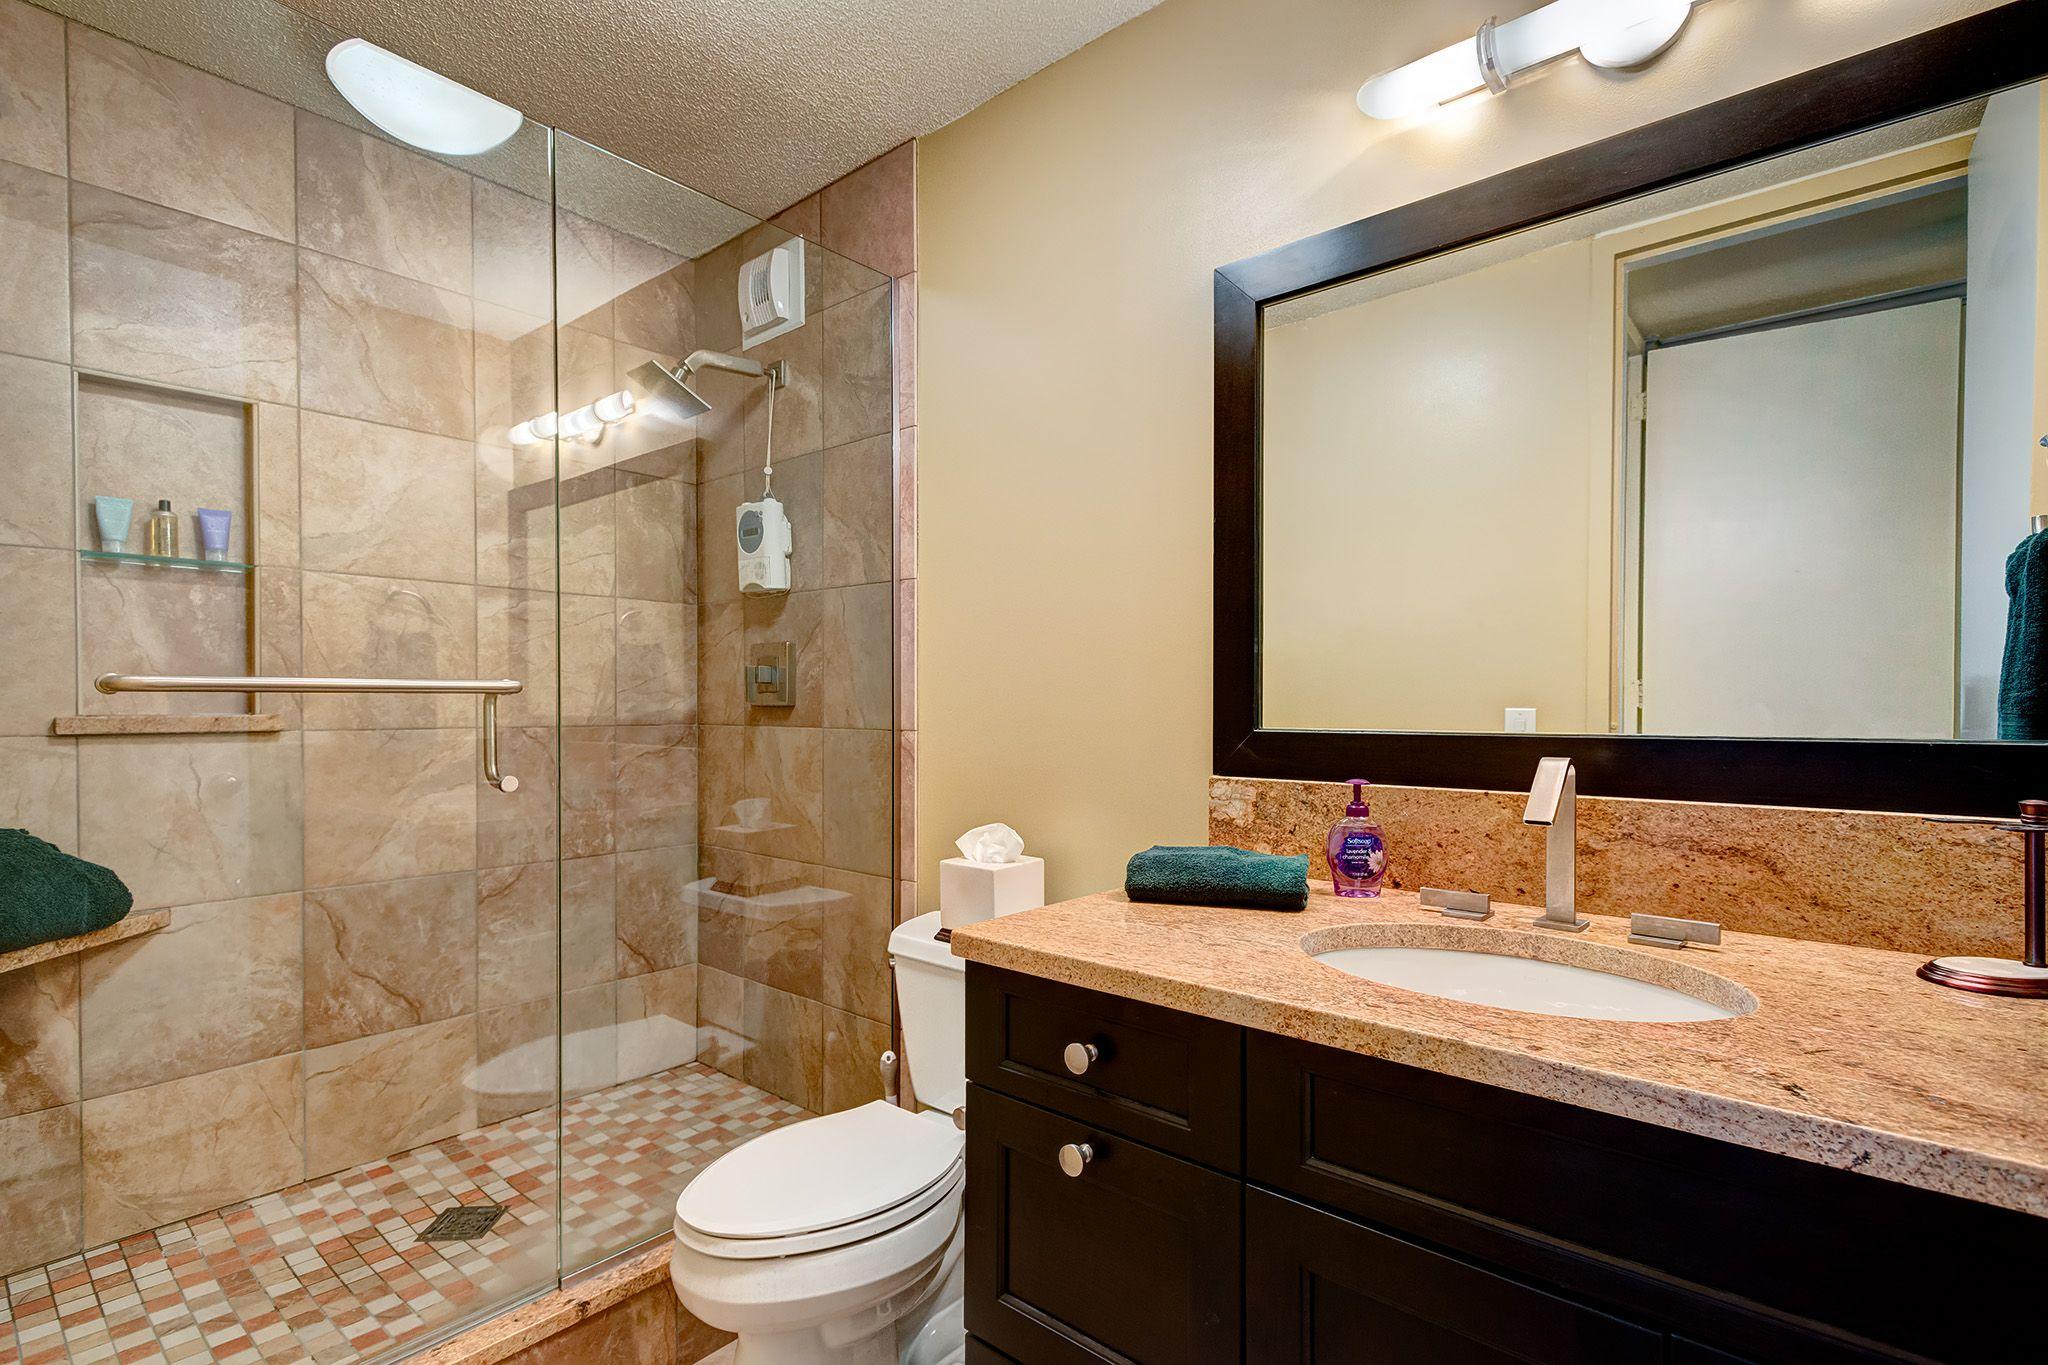 Bathroom renovation project chicago il michael menn ltd